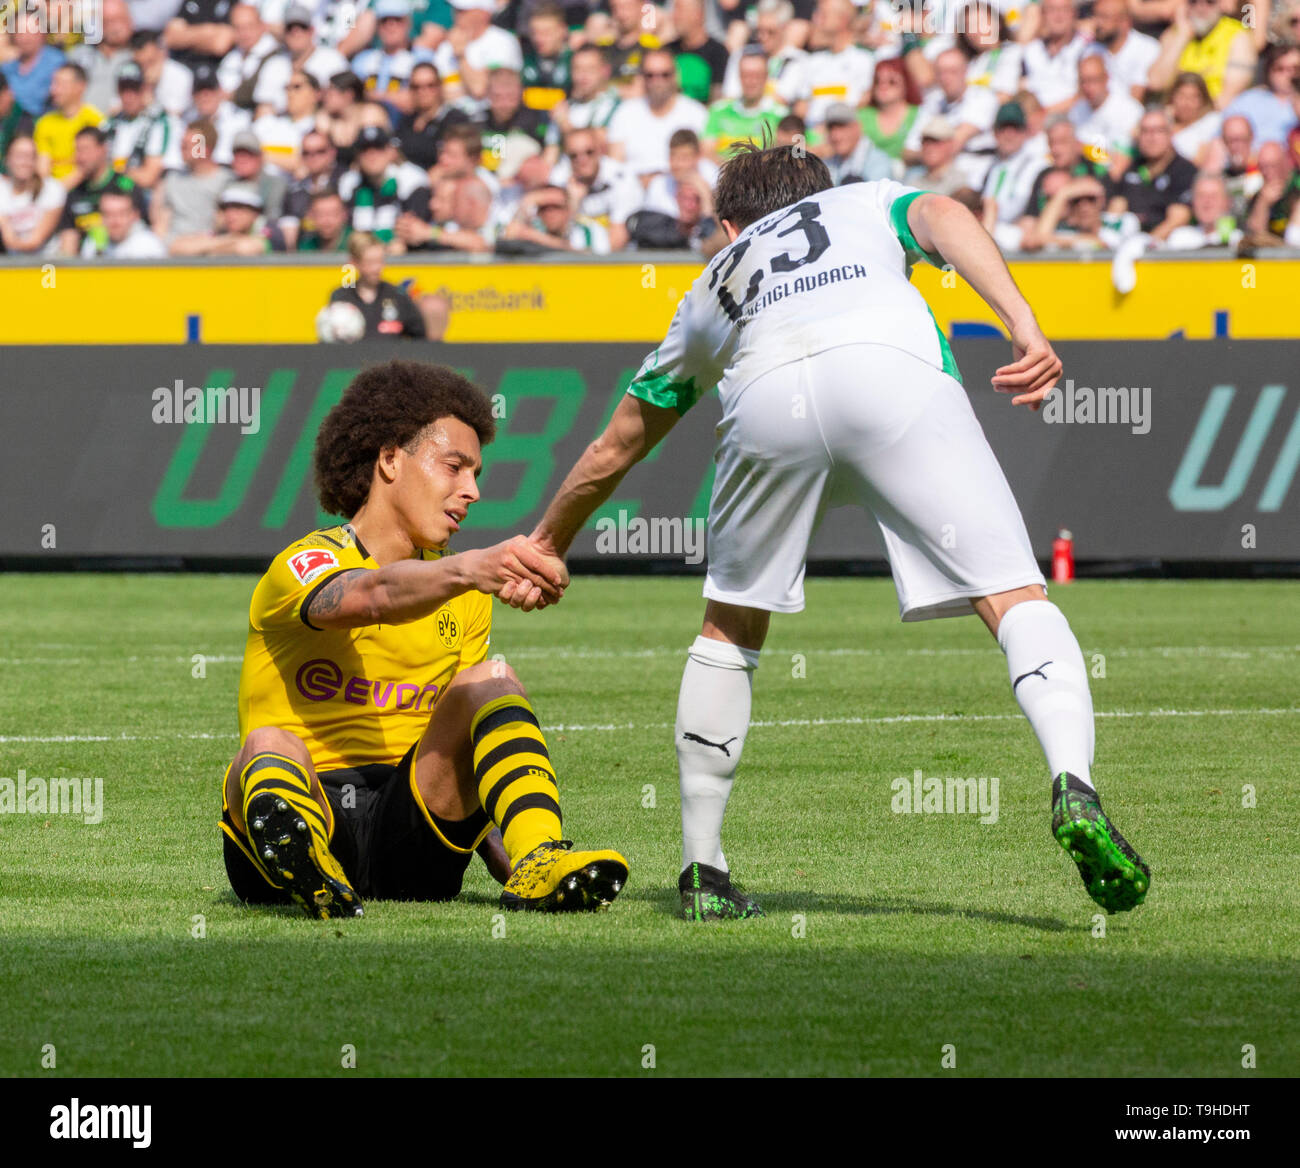 Sport, Fussball, Bundesliga, 2018/2019, Borussia Moenchengladbach vs. BVB Borussia Dortmund 0-2, Stadion Borussia-Park, Spielszene, Jonas Hofmann (MG) rechts hilft Axel Witsel (BVB) beim Aufstehen, DFL REGULATIONS PROHIBIT ANY USE OF PHOTOGRAPHS AS IMAGE SEQUENCES AND/OR QUASI-VIDEO, sports, football, Bundesliga, 2018/2019, Borussia Moenchengladbach vs. BVB Borussia Dortmund 0-2, Stadium Borussia Park, scene of the match, Jonas Hofmann (MG) right supports Axel Witsel (BVB) to get up, DFL REGULATIONS PROHIBIT ANY USE OF PHOTOGRAPHS AS IMAGE SEQUENCES AND/OR QUASI-VIDEO *** Local Caption *** spo - Stock Image